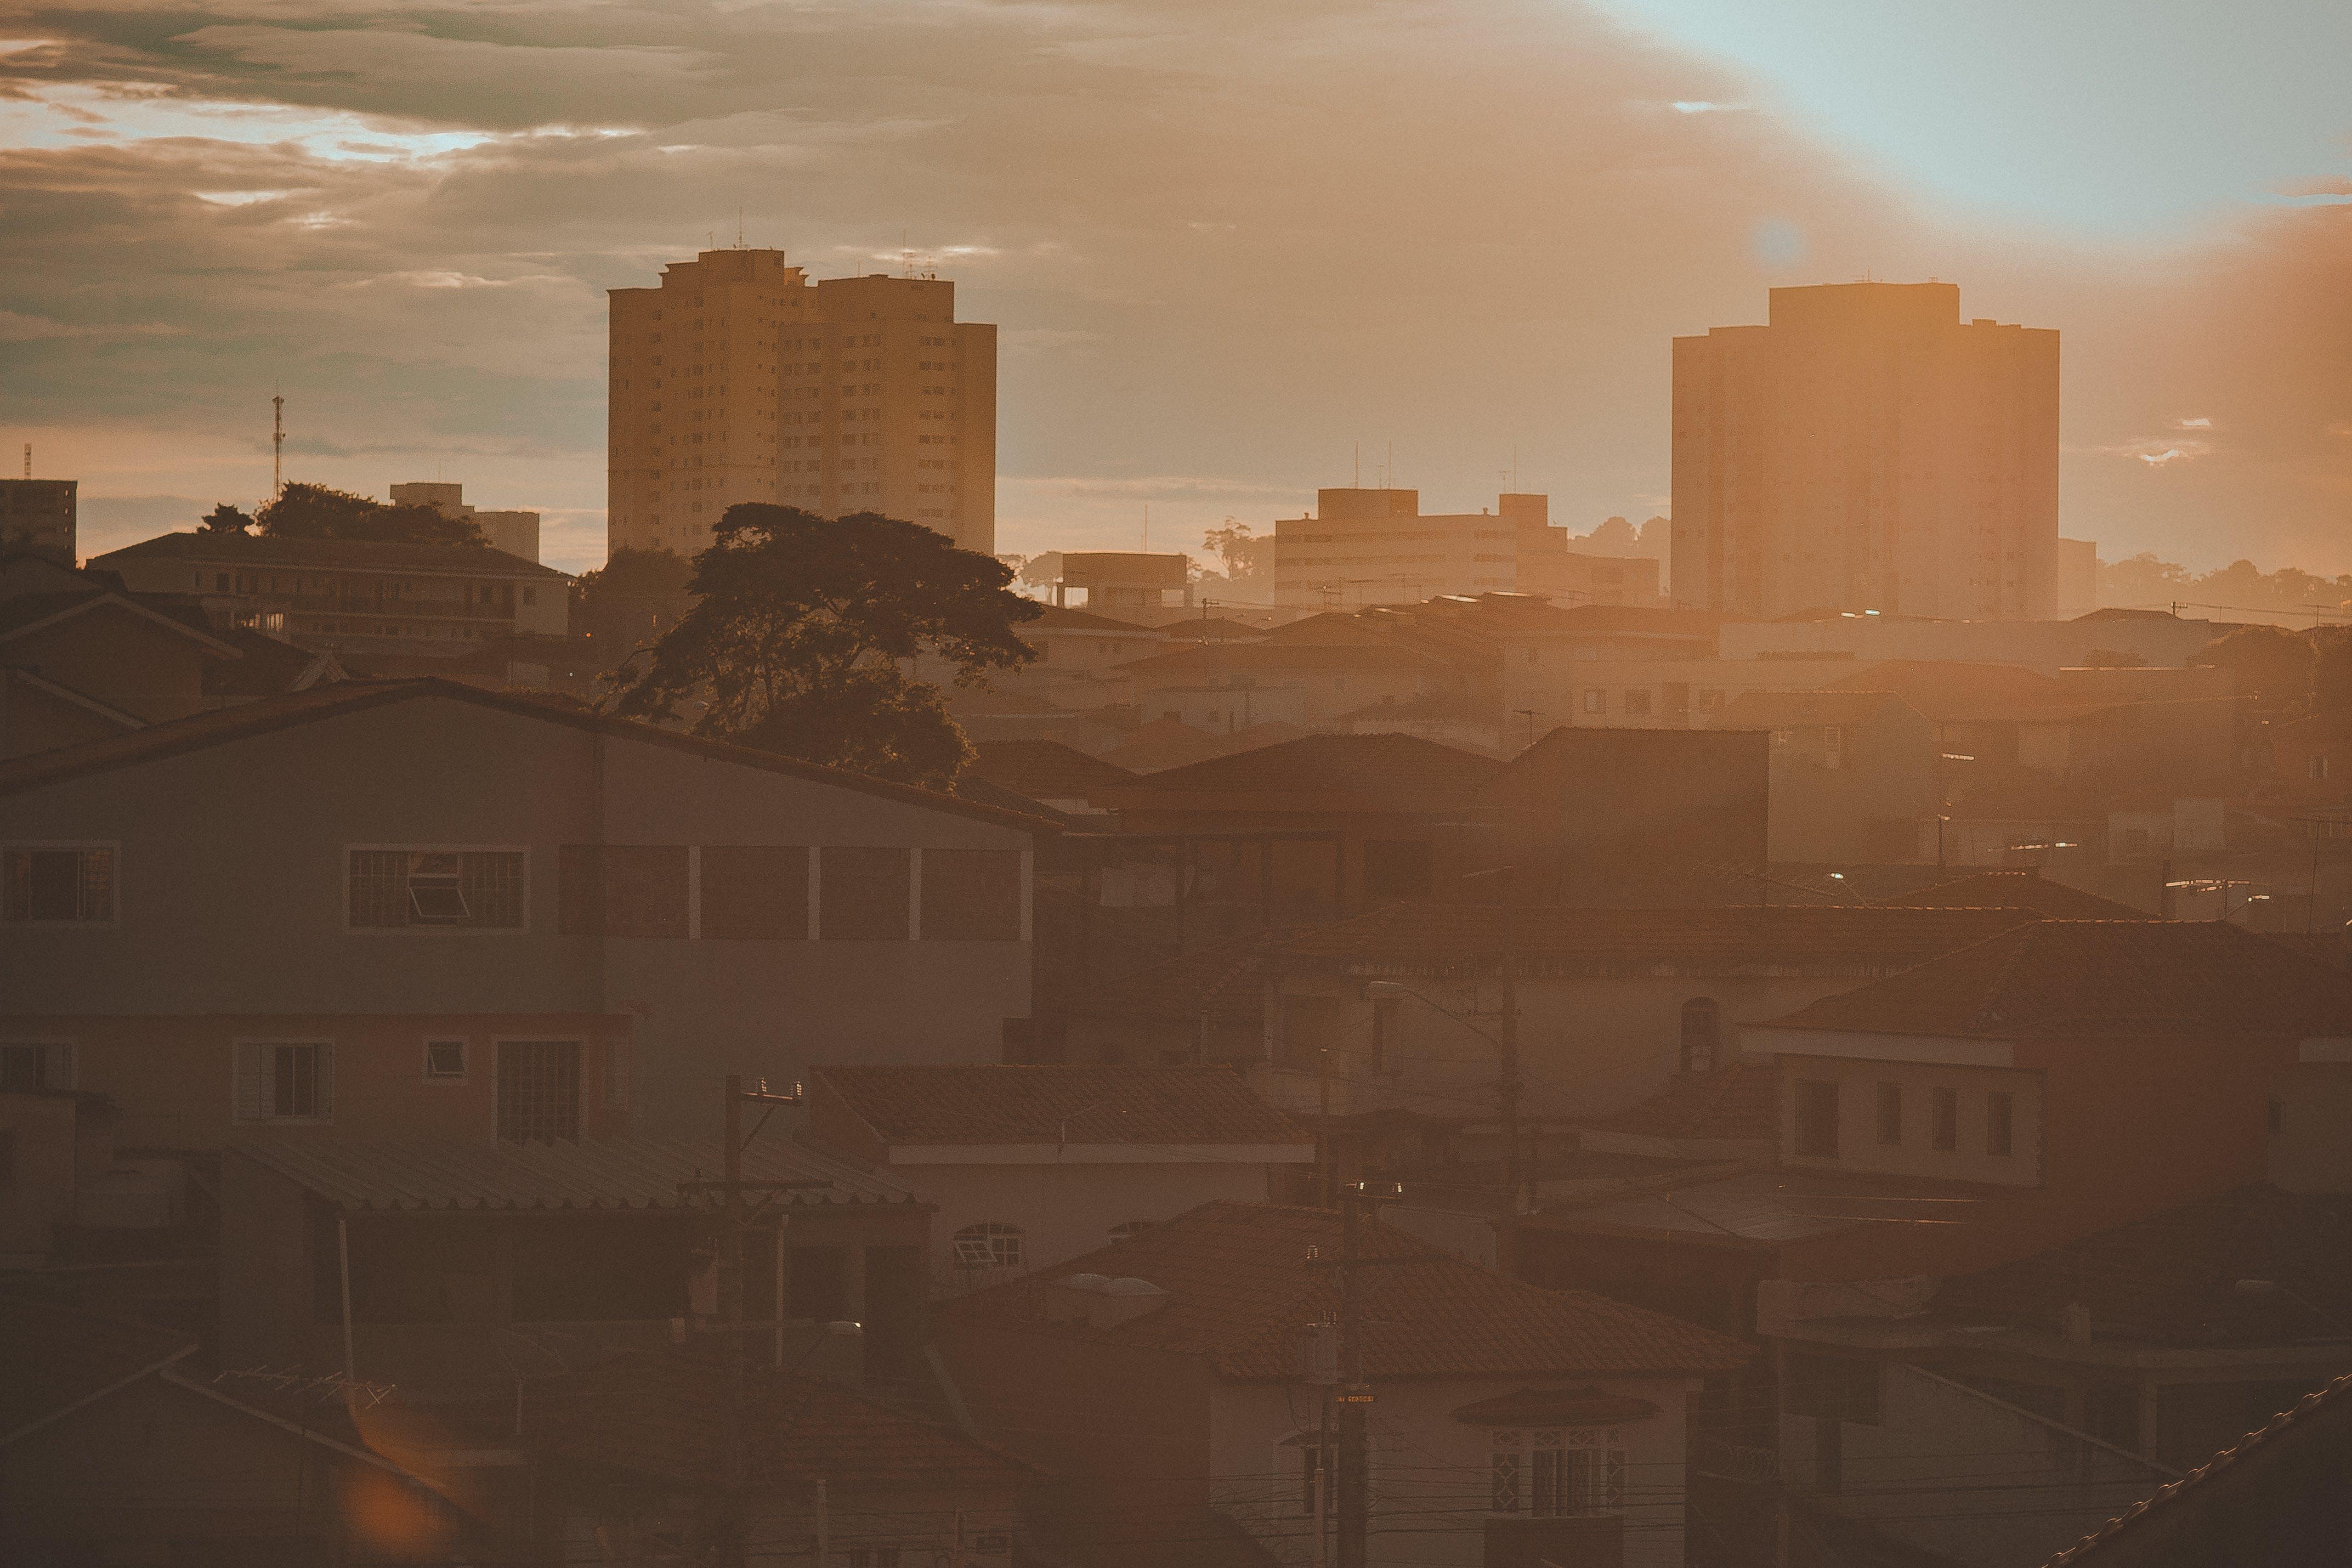 Kostenloses Stock Foto zu bairro, casas, goldene sonne, luz do sol